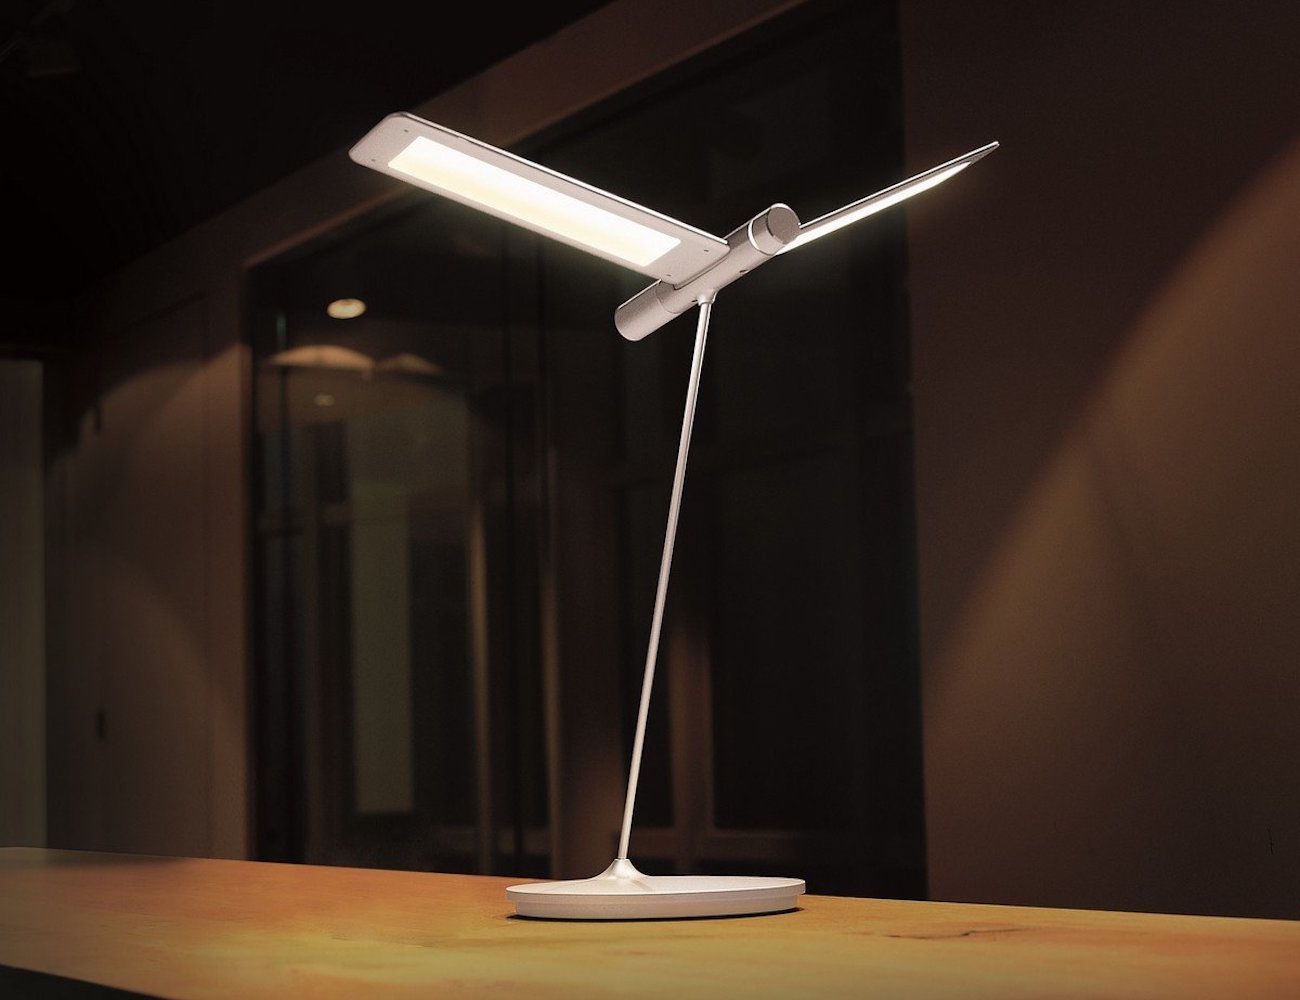 Seagull LED Desk Lamp By QisDesign ...